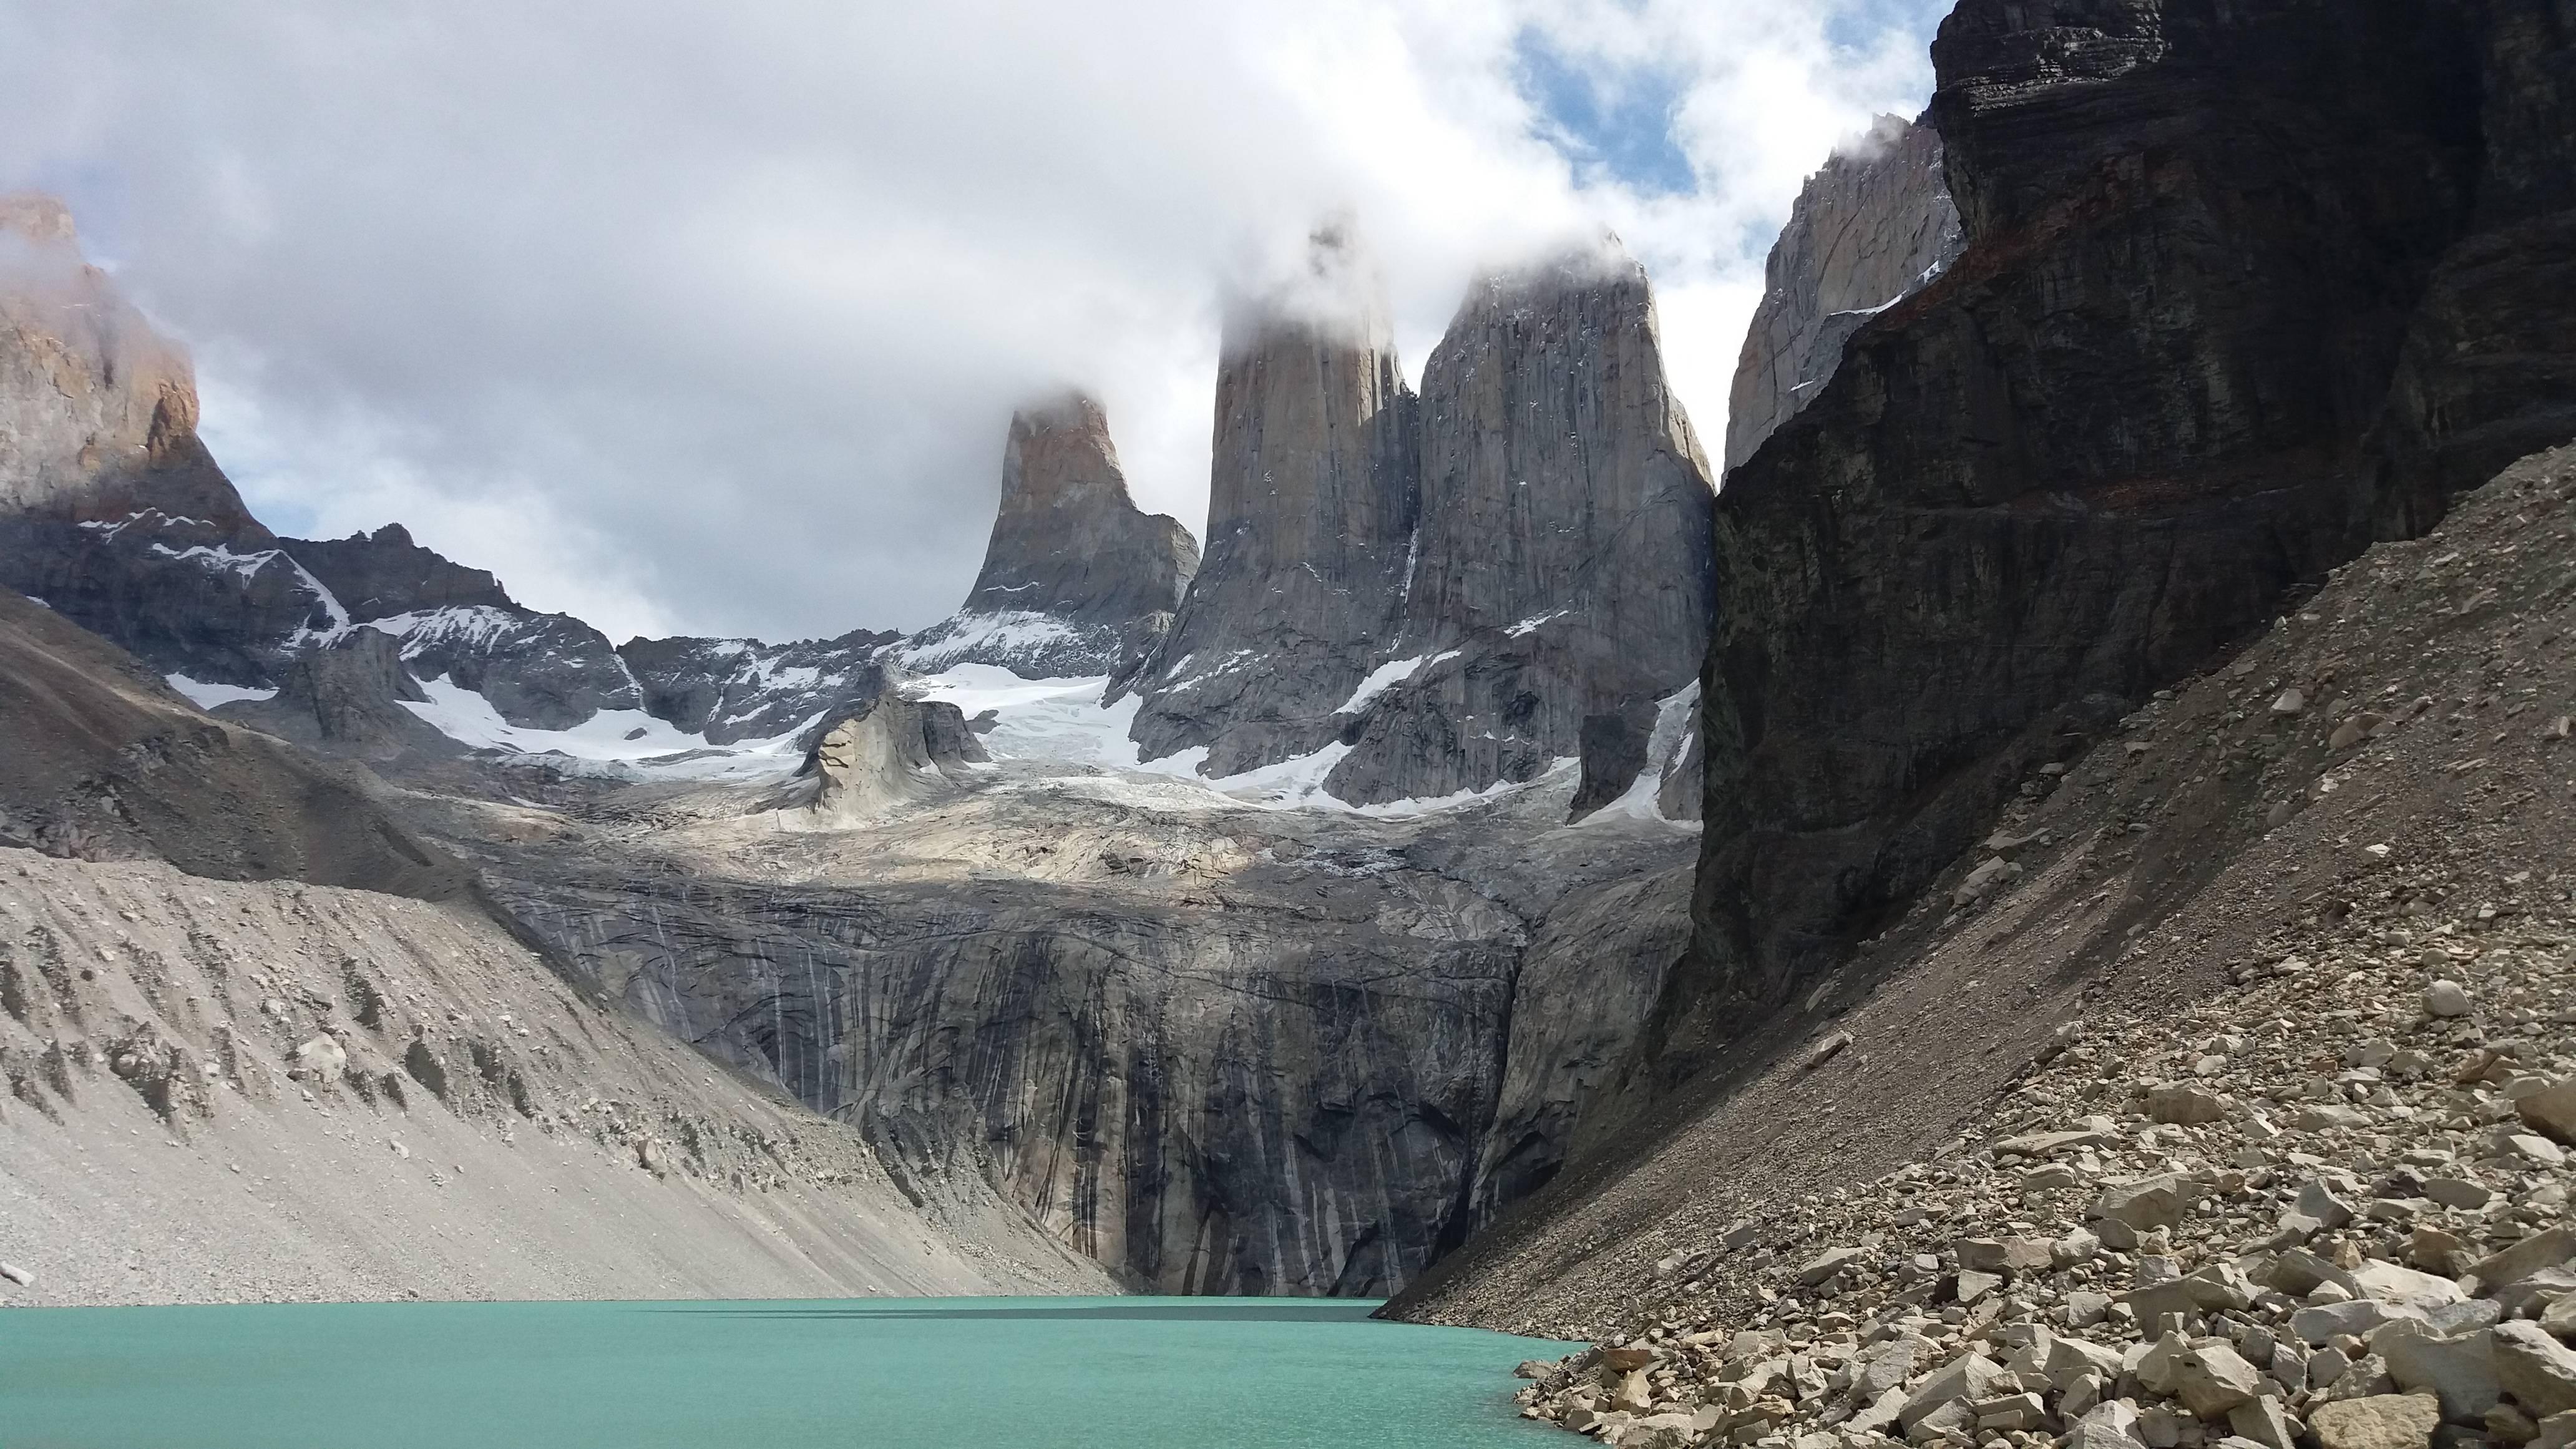 Photo 1: Torres del Paine, Las Torres. Un super Trek !